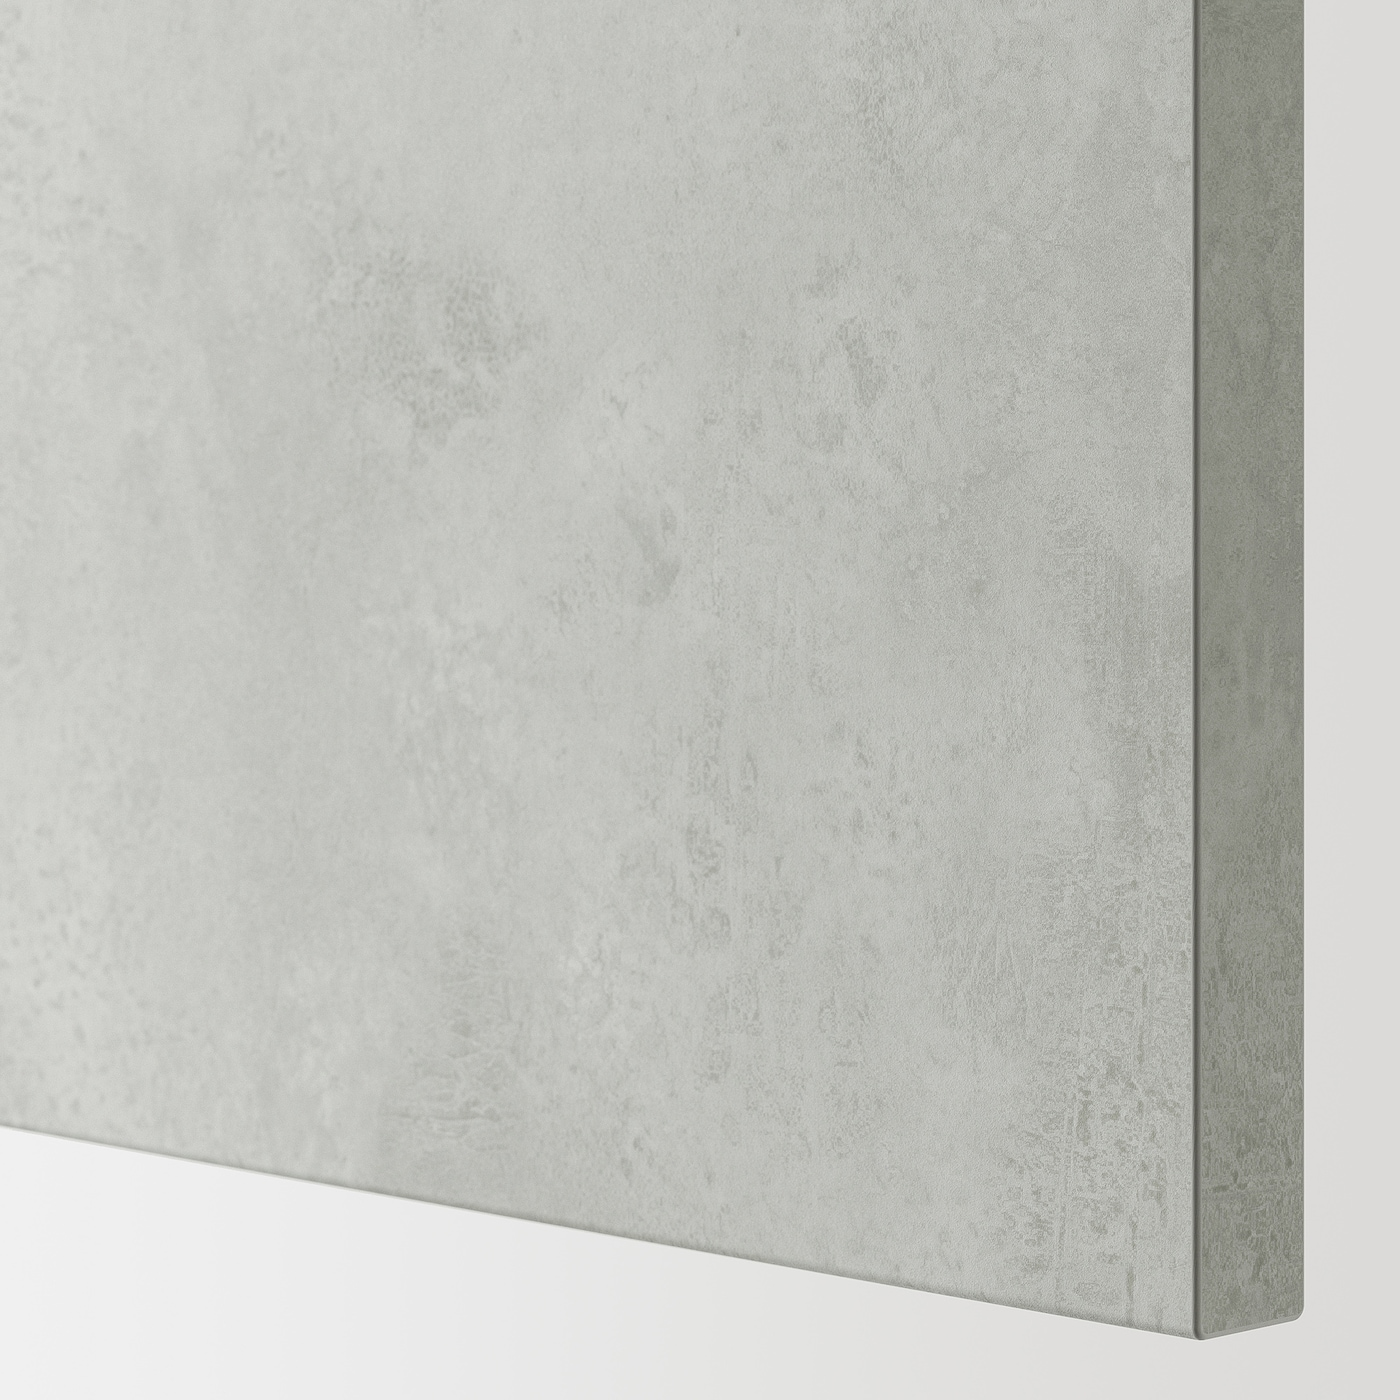 ENHET Wall cb w 2 shlvs/door, white/concrete effect, 60x30x75 cm